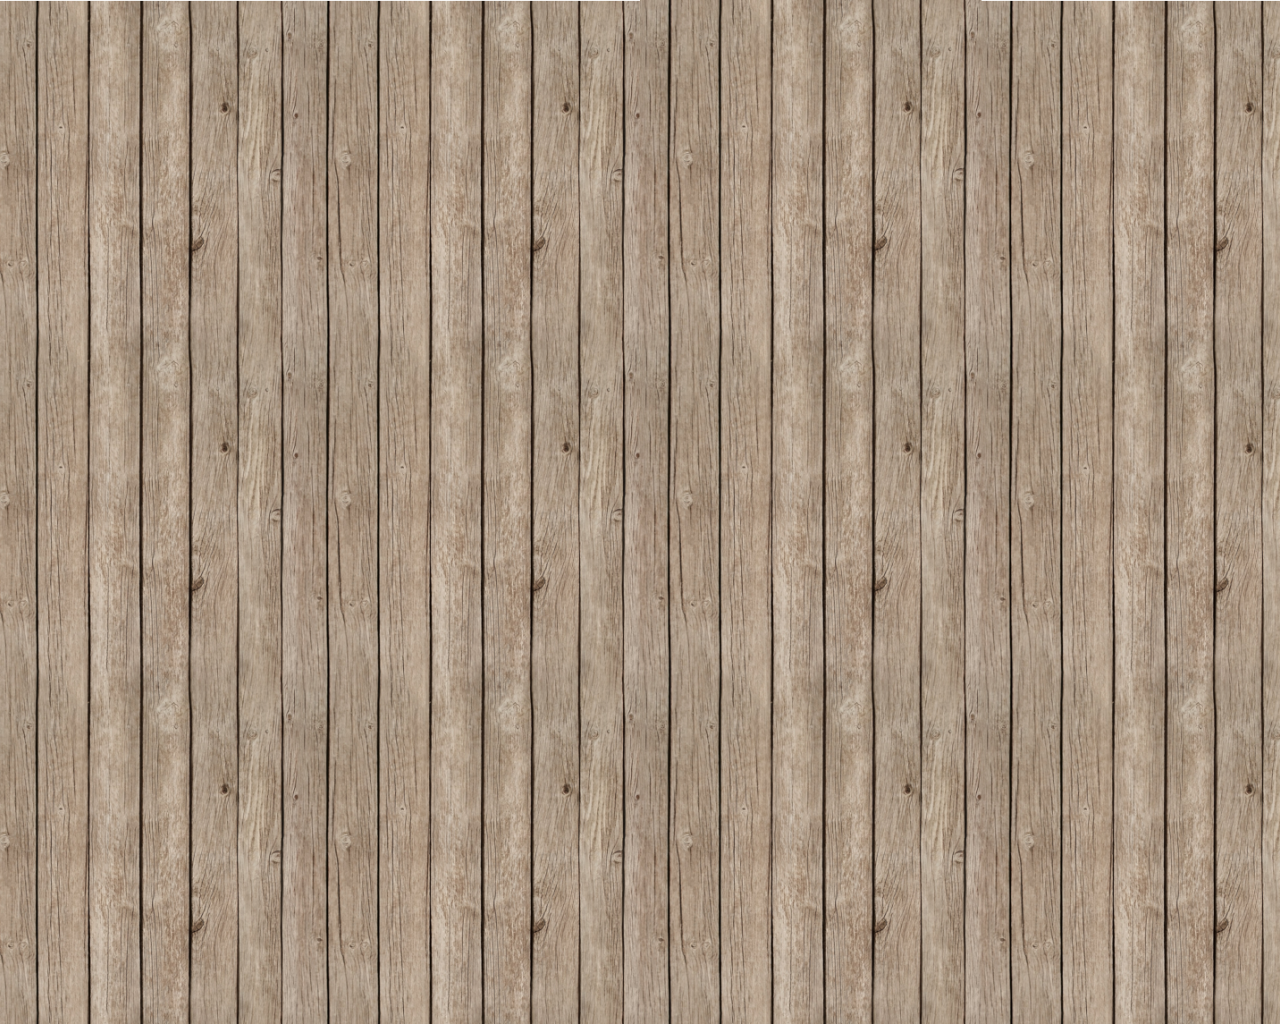 Free Download Httpwwwundersizedurbanitecomfree Dollhouse Flooring Printables 1528x1145 For Your Desktop Mobile Tablet Explore 49 Dollhouse Miniature Wallpaper Itsy Bitsy Dollhouse Wallpaper Dollhouse Miniature Asian Wallpaper Printable